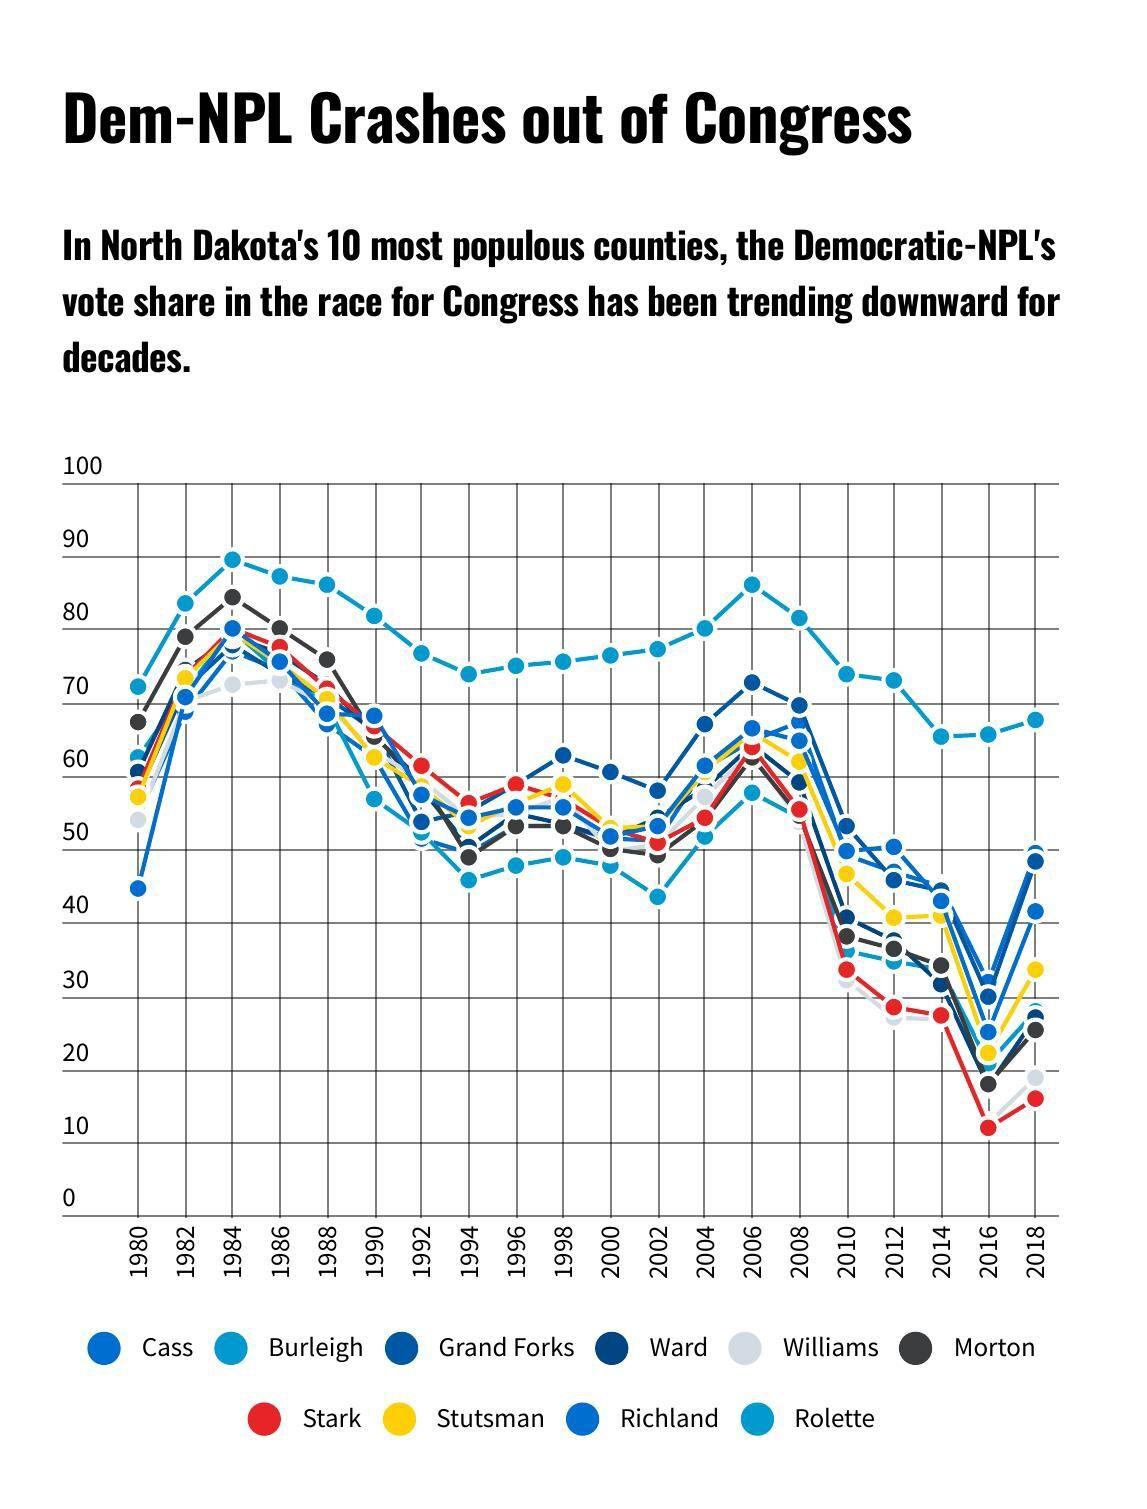 Dem-NPL Crashes out of Congress